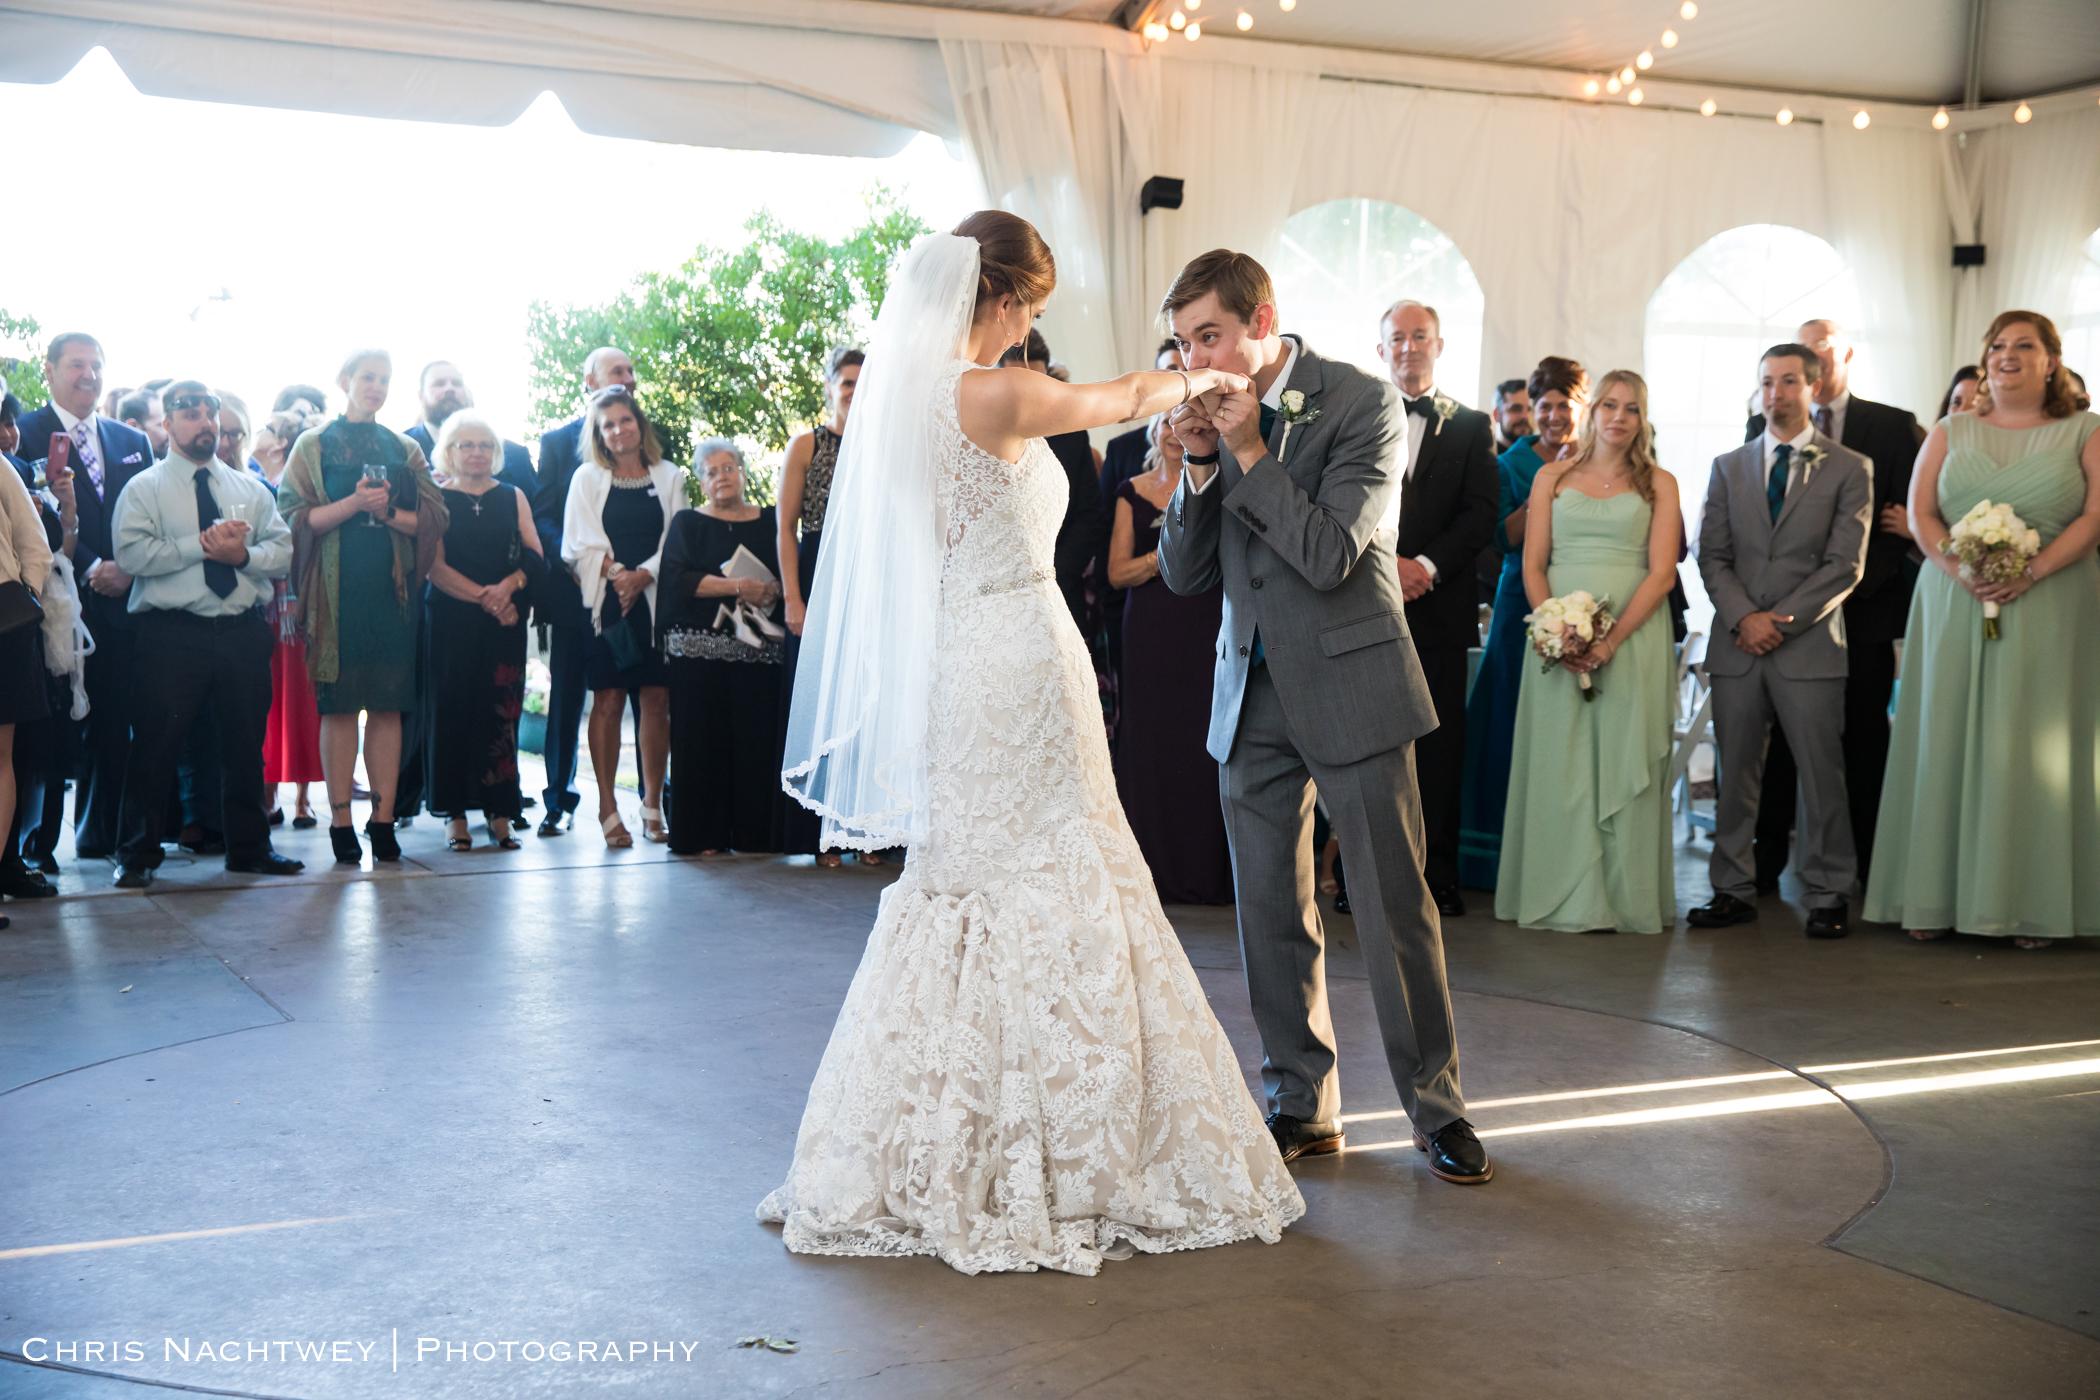 harkness-wedding-photos-chris-nachtwey-photography-2018-25.jpg